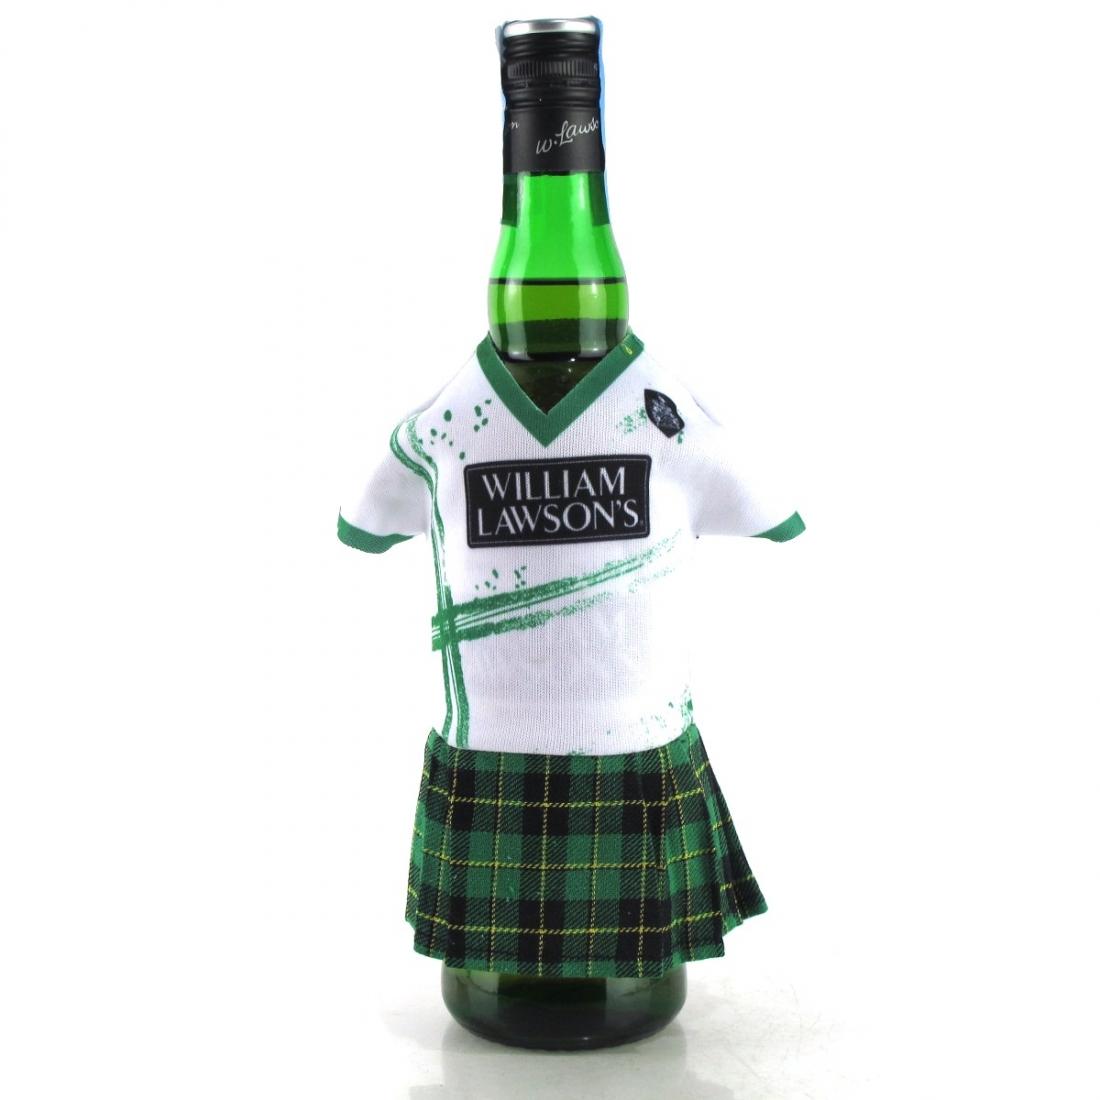 William Lawson's Scotch Whisky